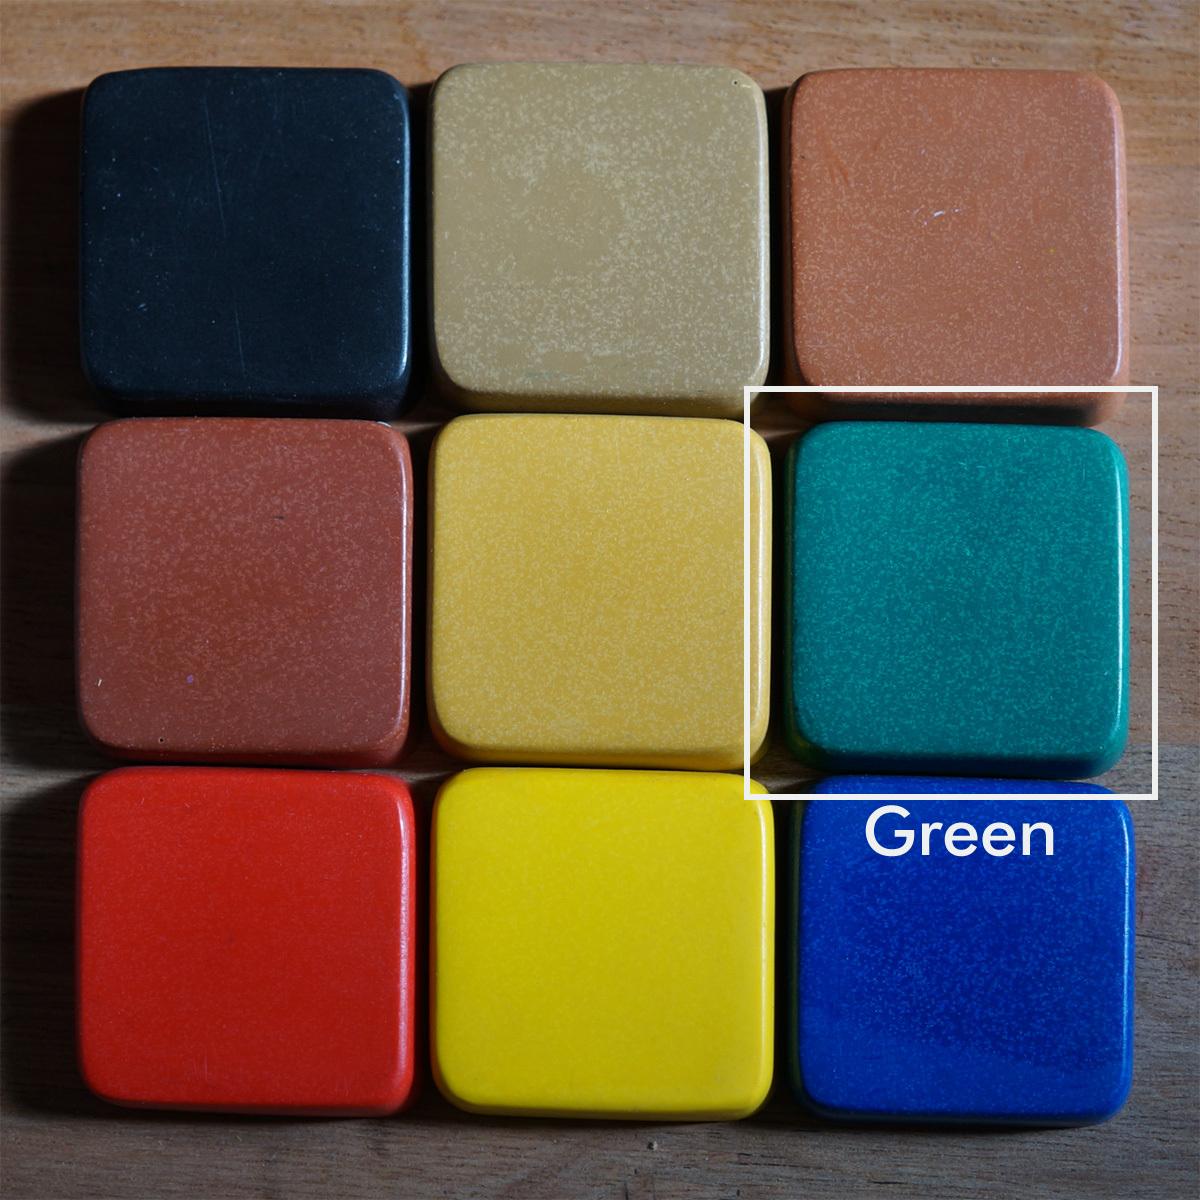 PIGMENT GREEN 100g(着色剤:緑 100g) - 画像2